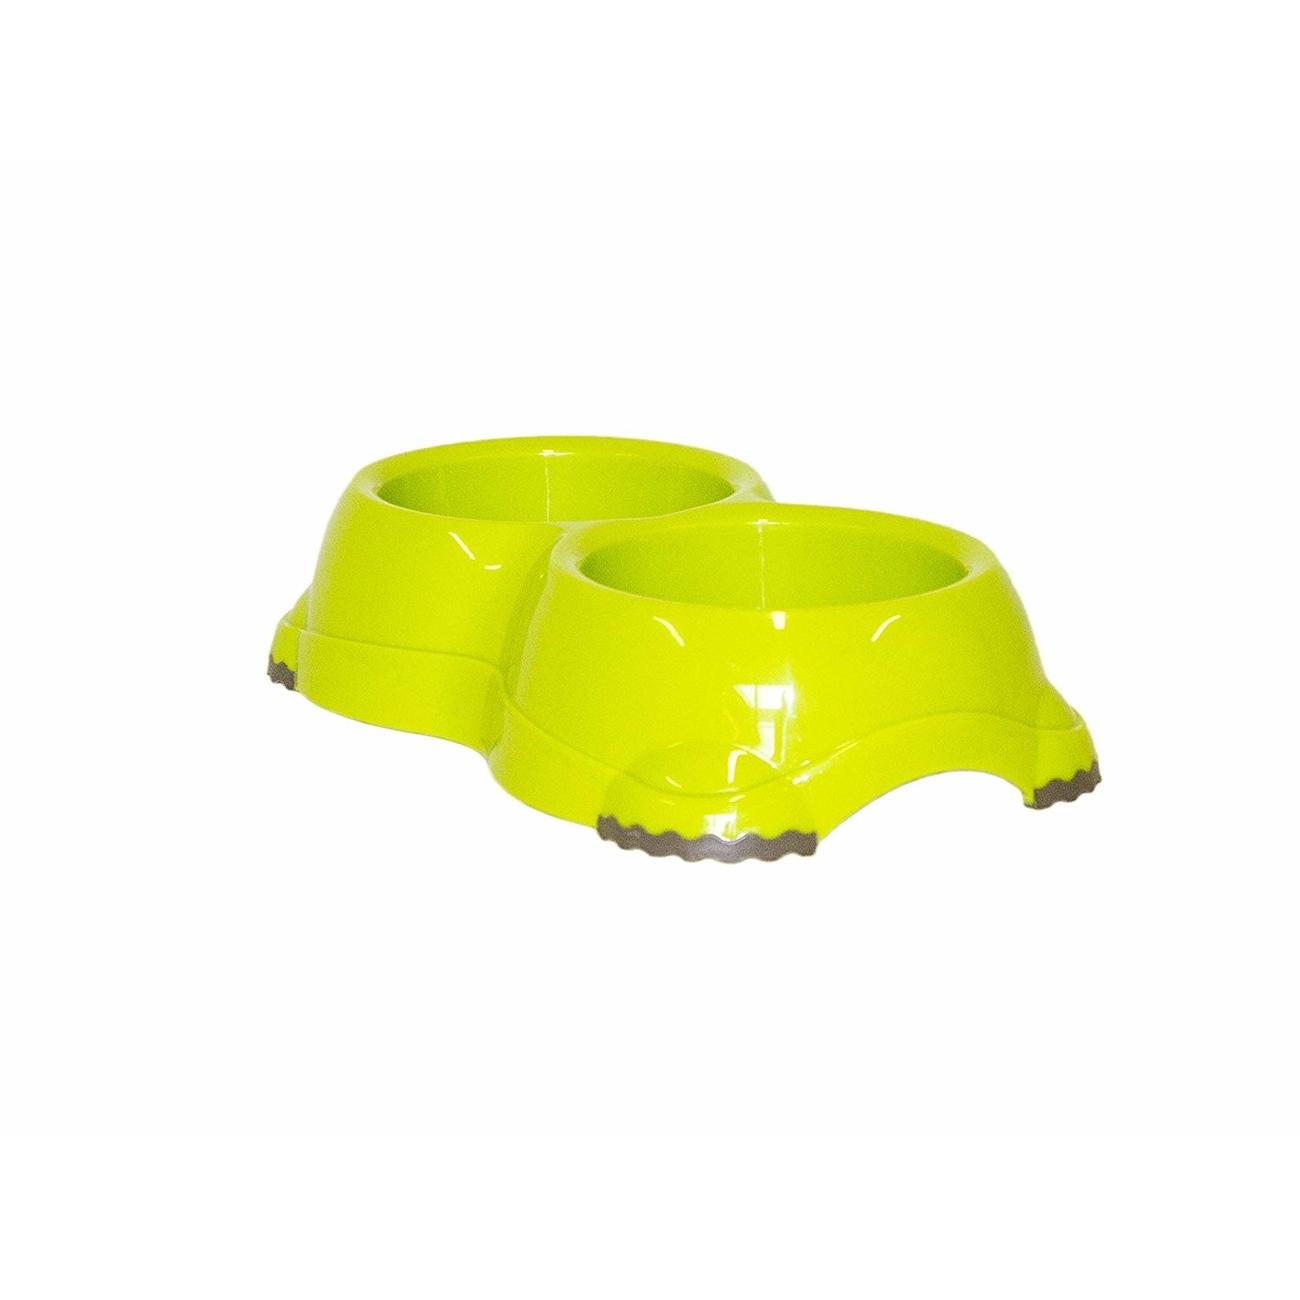 Moderna Doppelnapf Smarty Bowl, Bild 3